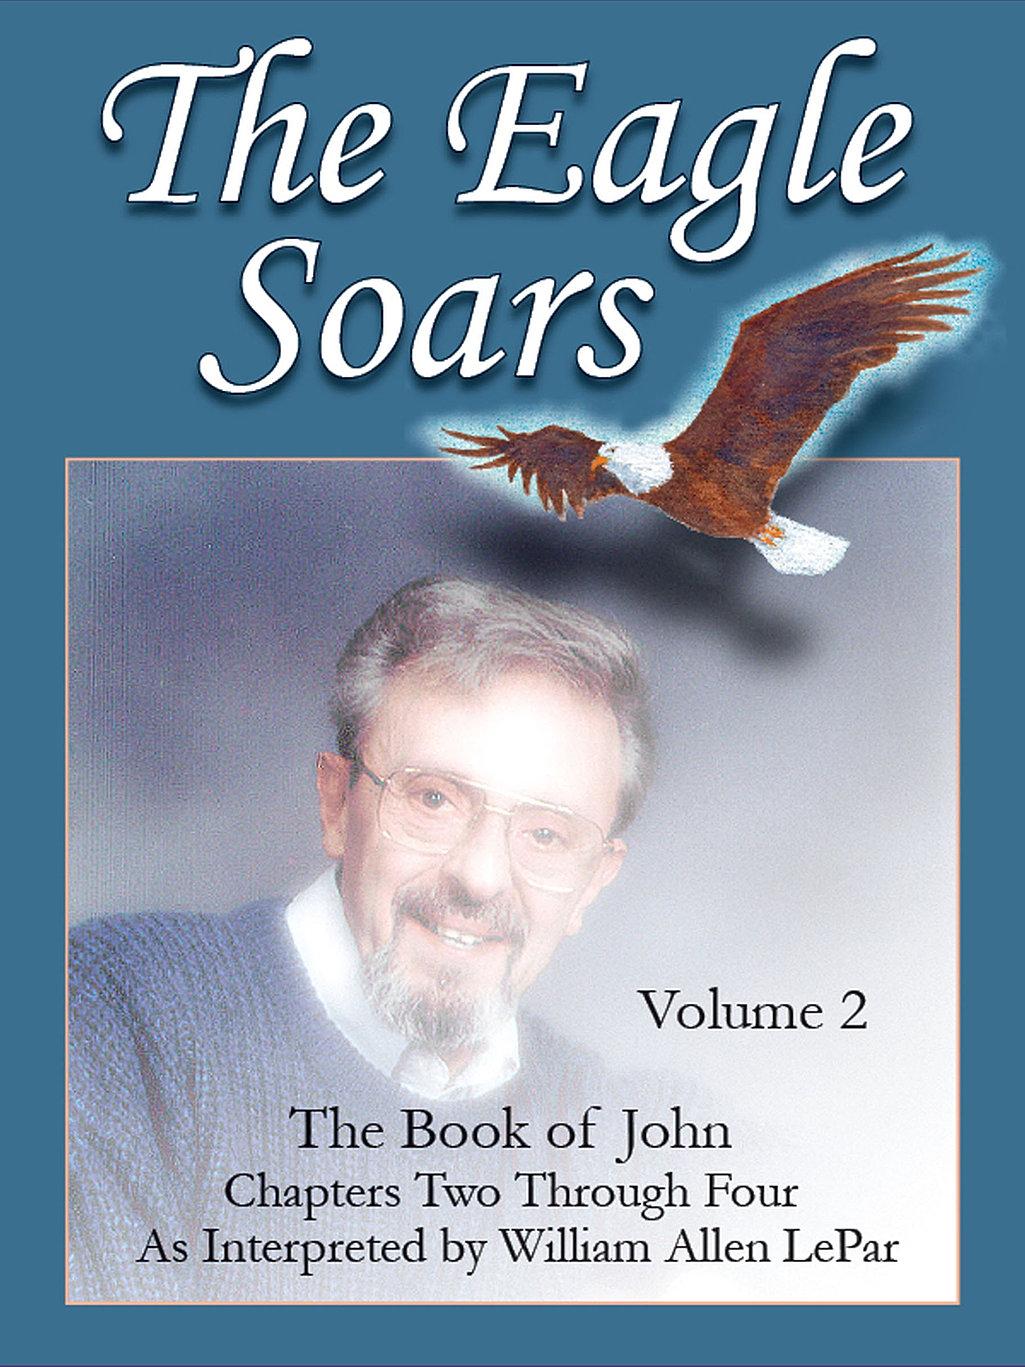 Eagle Soars Vol2 Cover.jpg